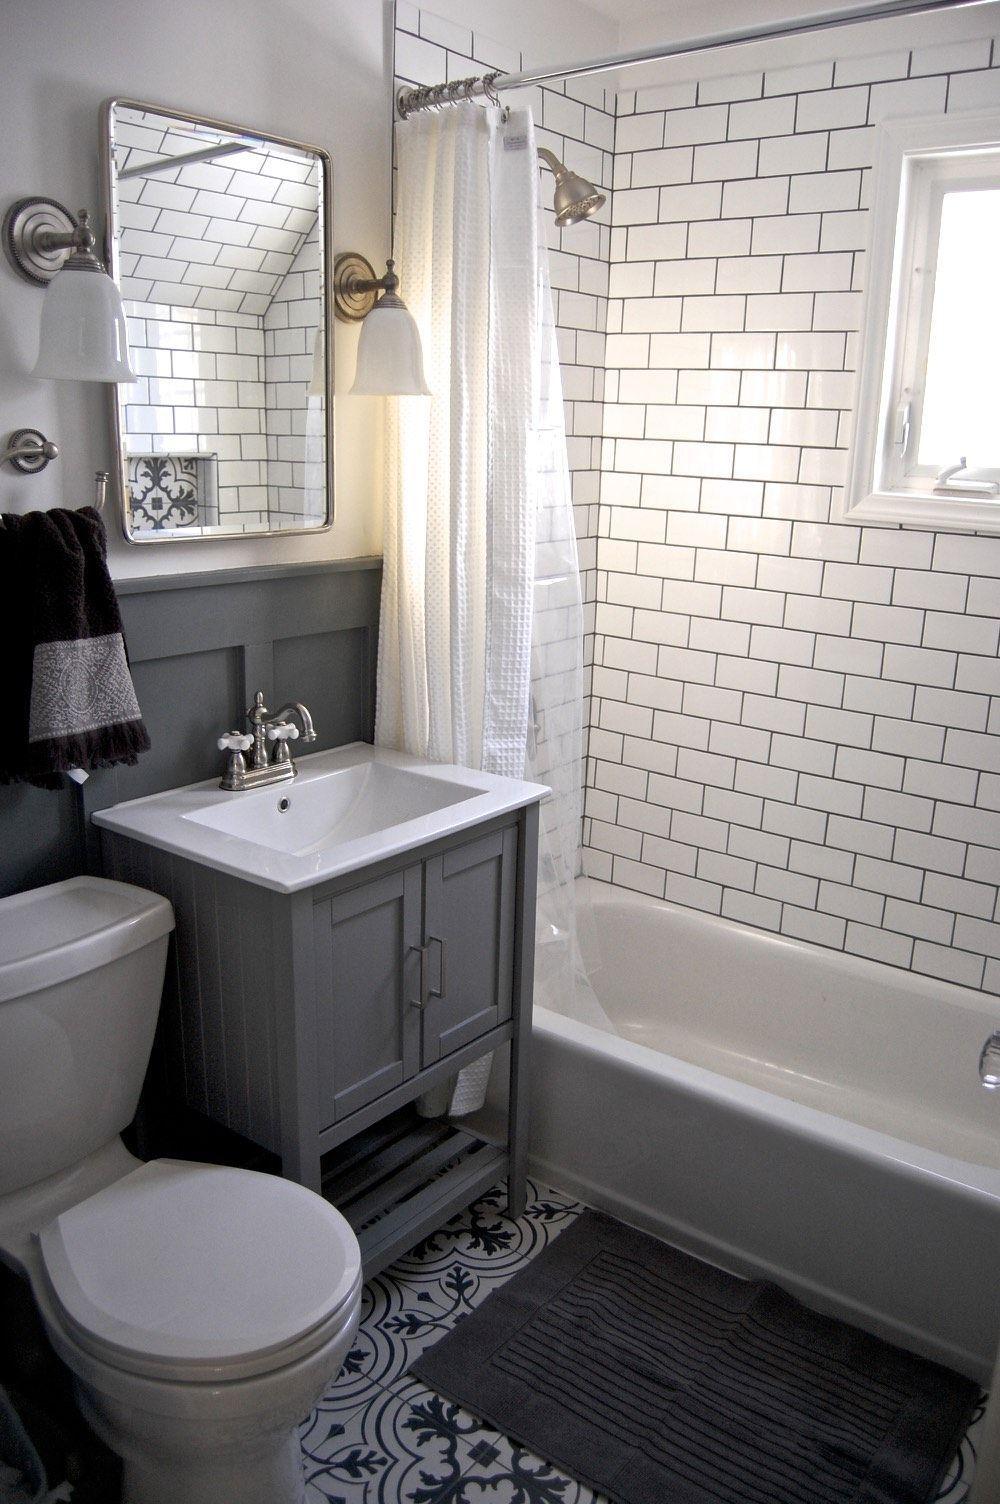 40 Best Bathroom Renovation Ideas Bathroom Diybathroomrenovationideas Ideas Renovation In 2020 Small Bathroom Gray And White Bathroom Small Bathroom Inspiration